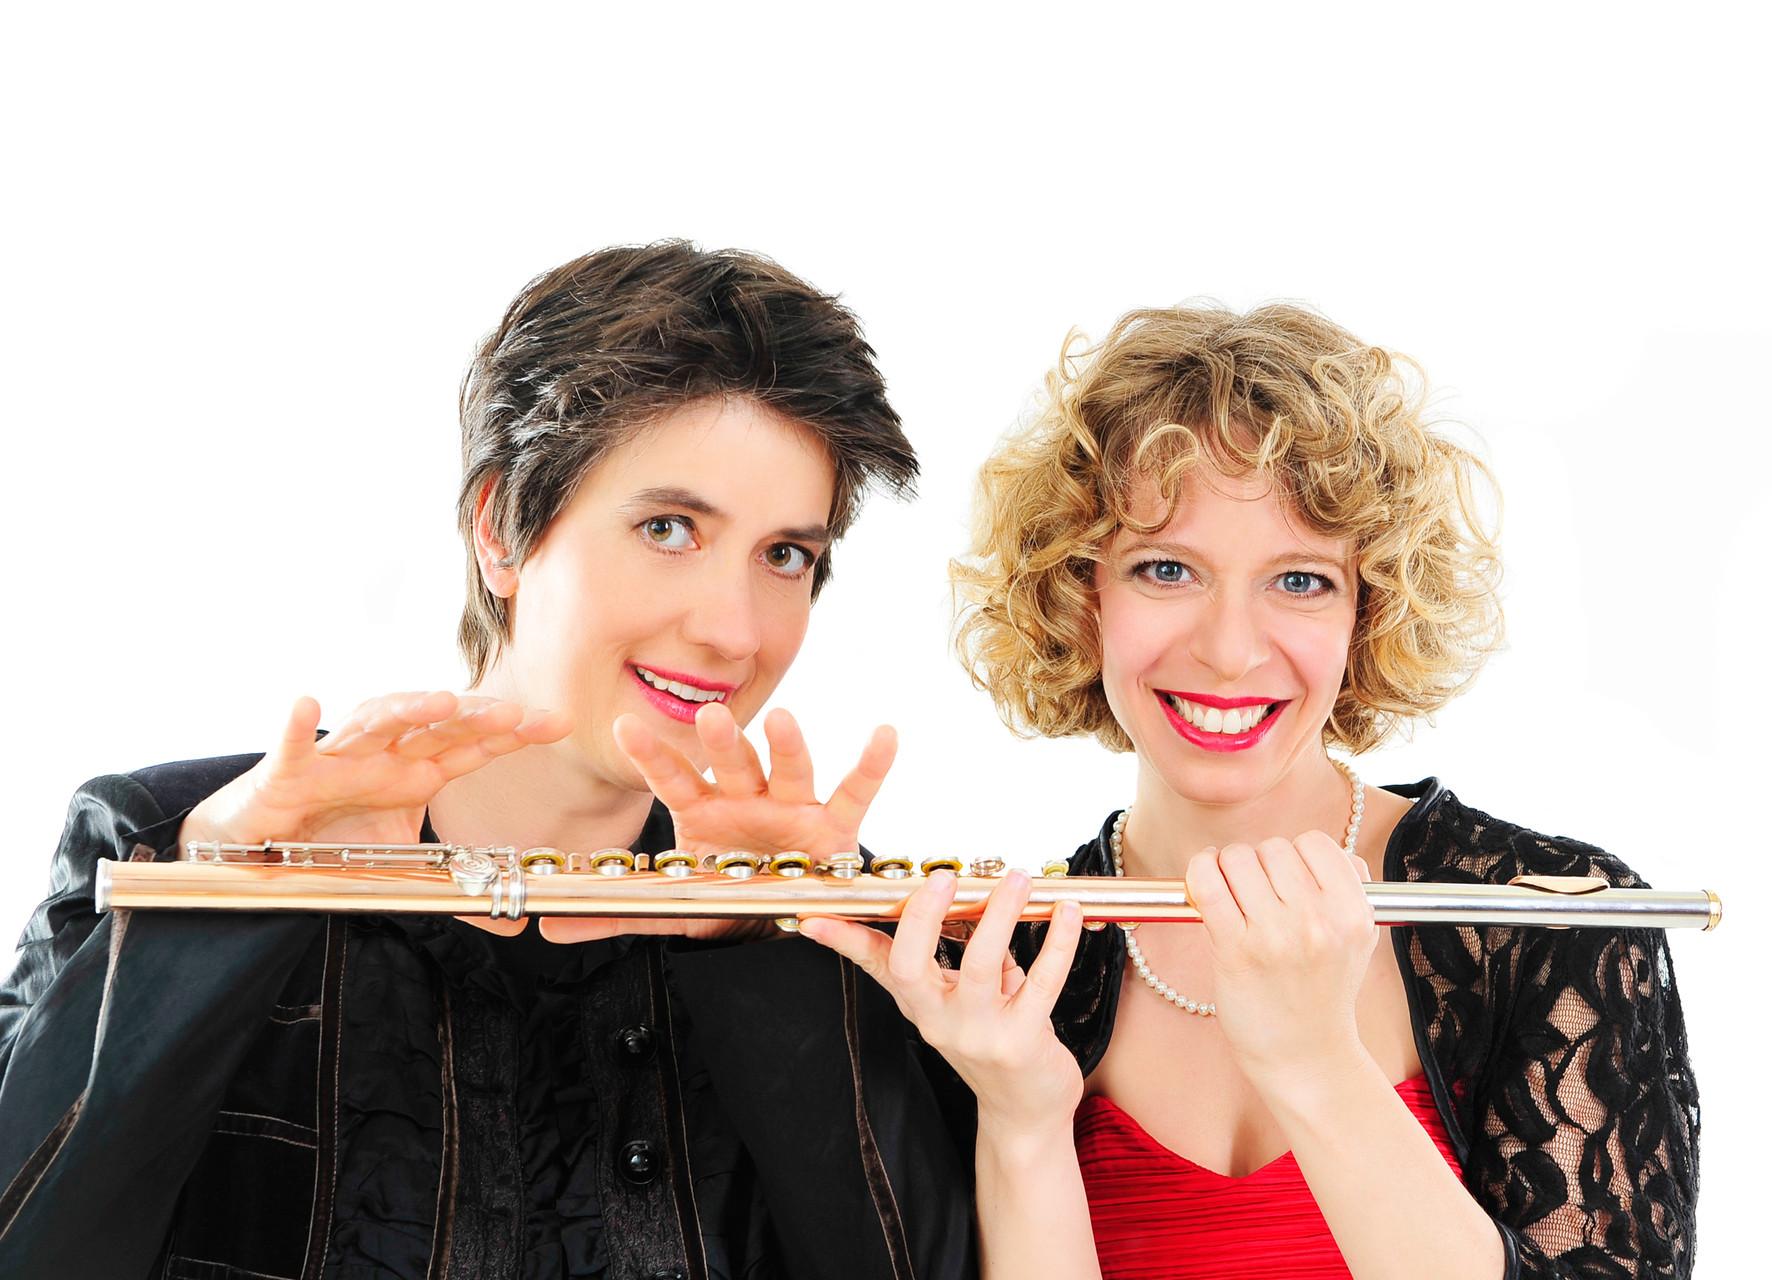 Kammermusik-Duo Terragni-Sarasin